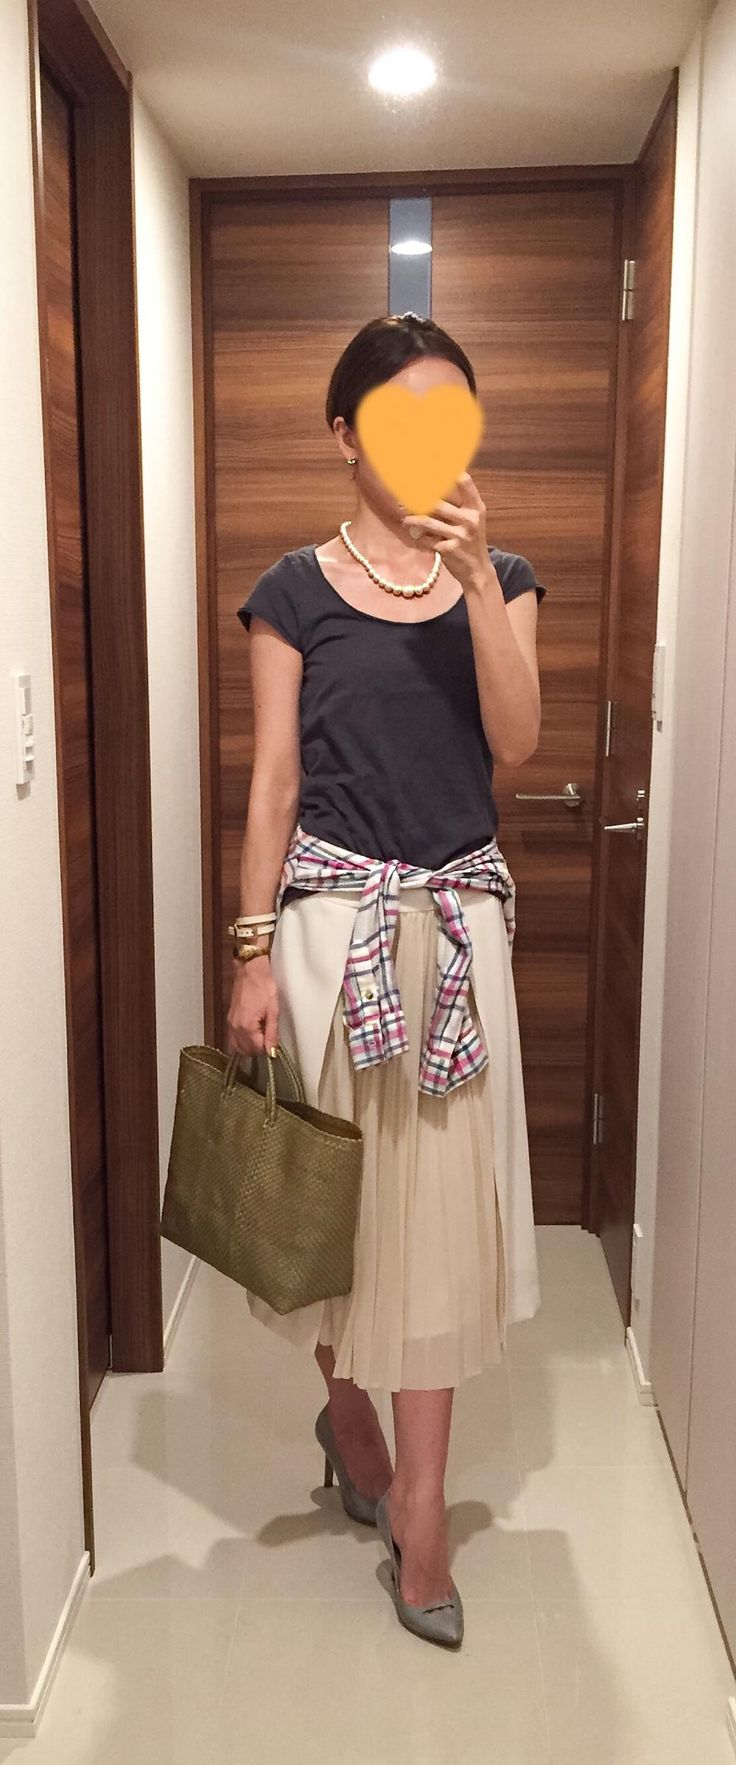 Grey tee: SISLEY, Plaid shirt: Lovers + Friends, White long skirt: Des Pres…